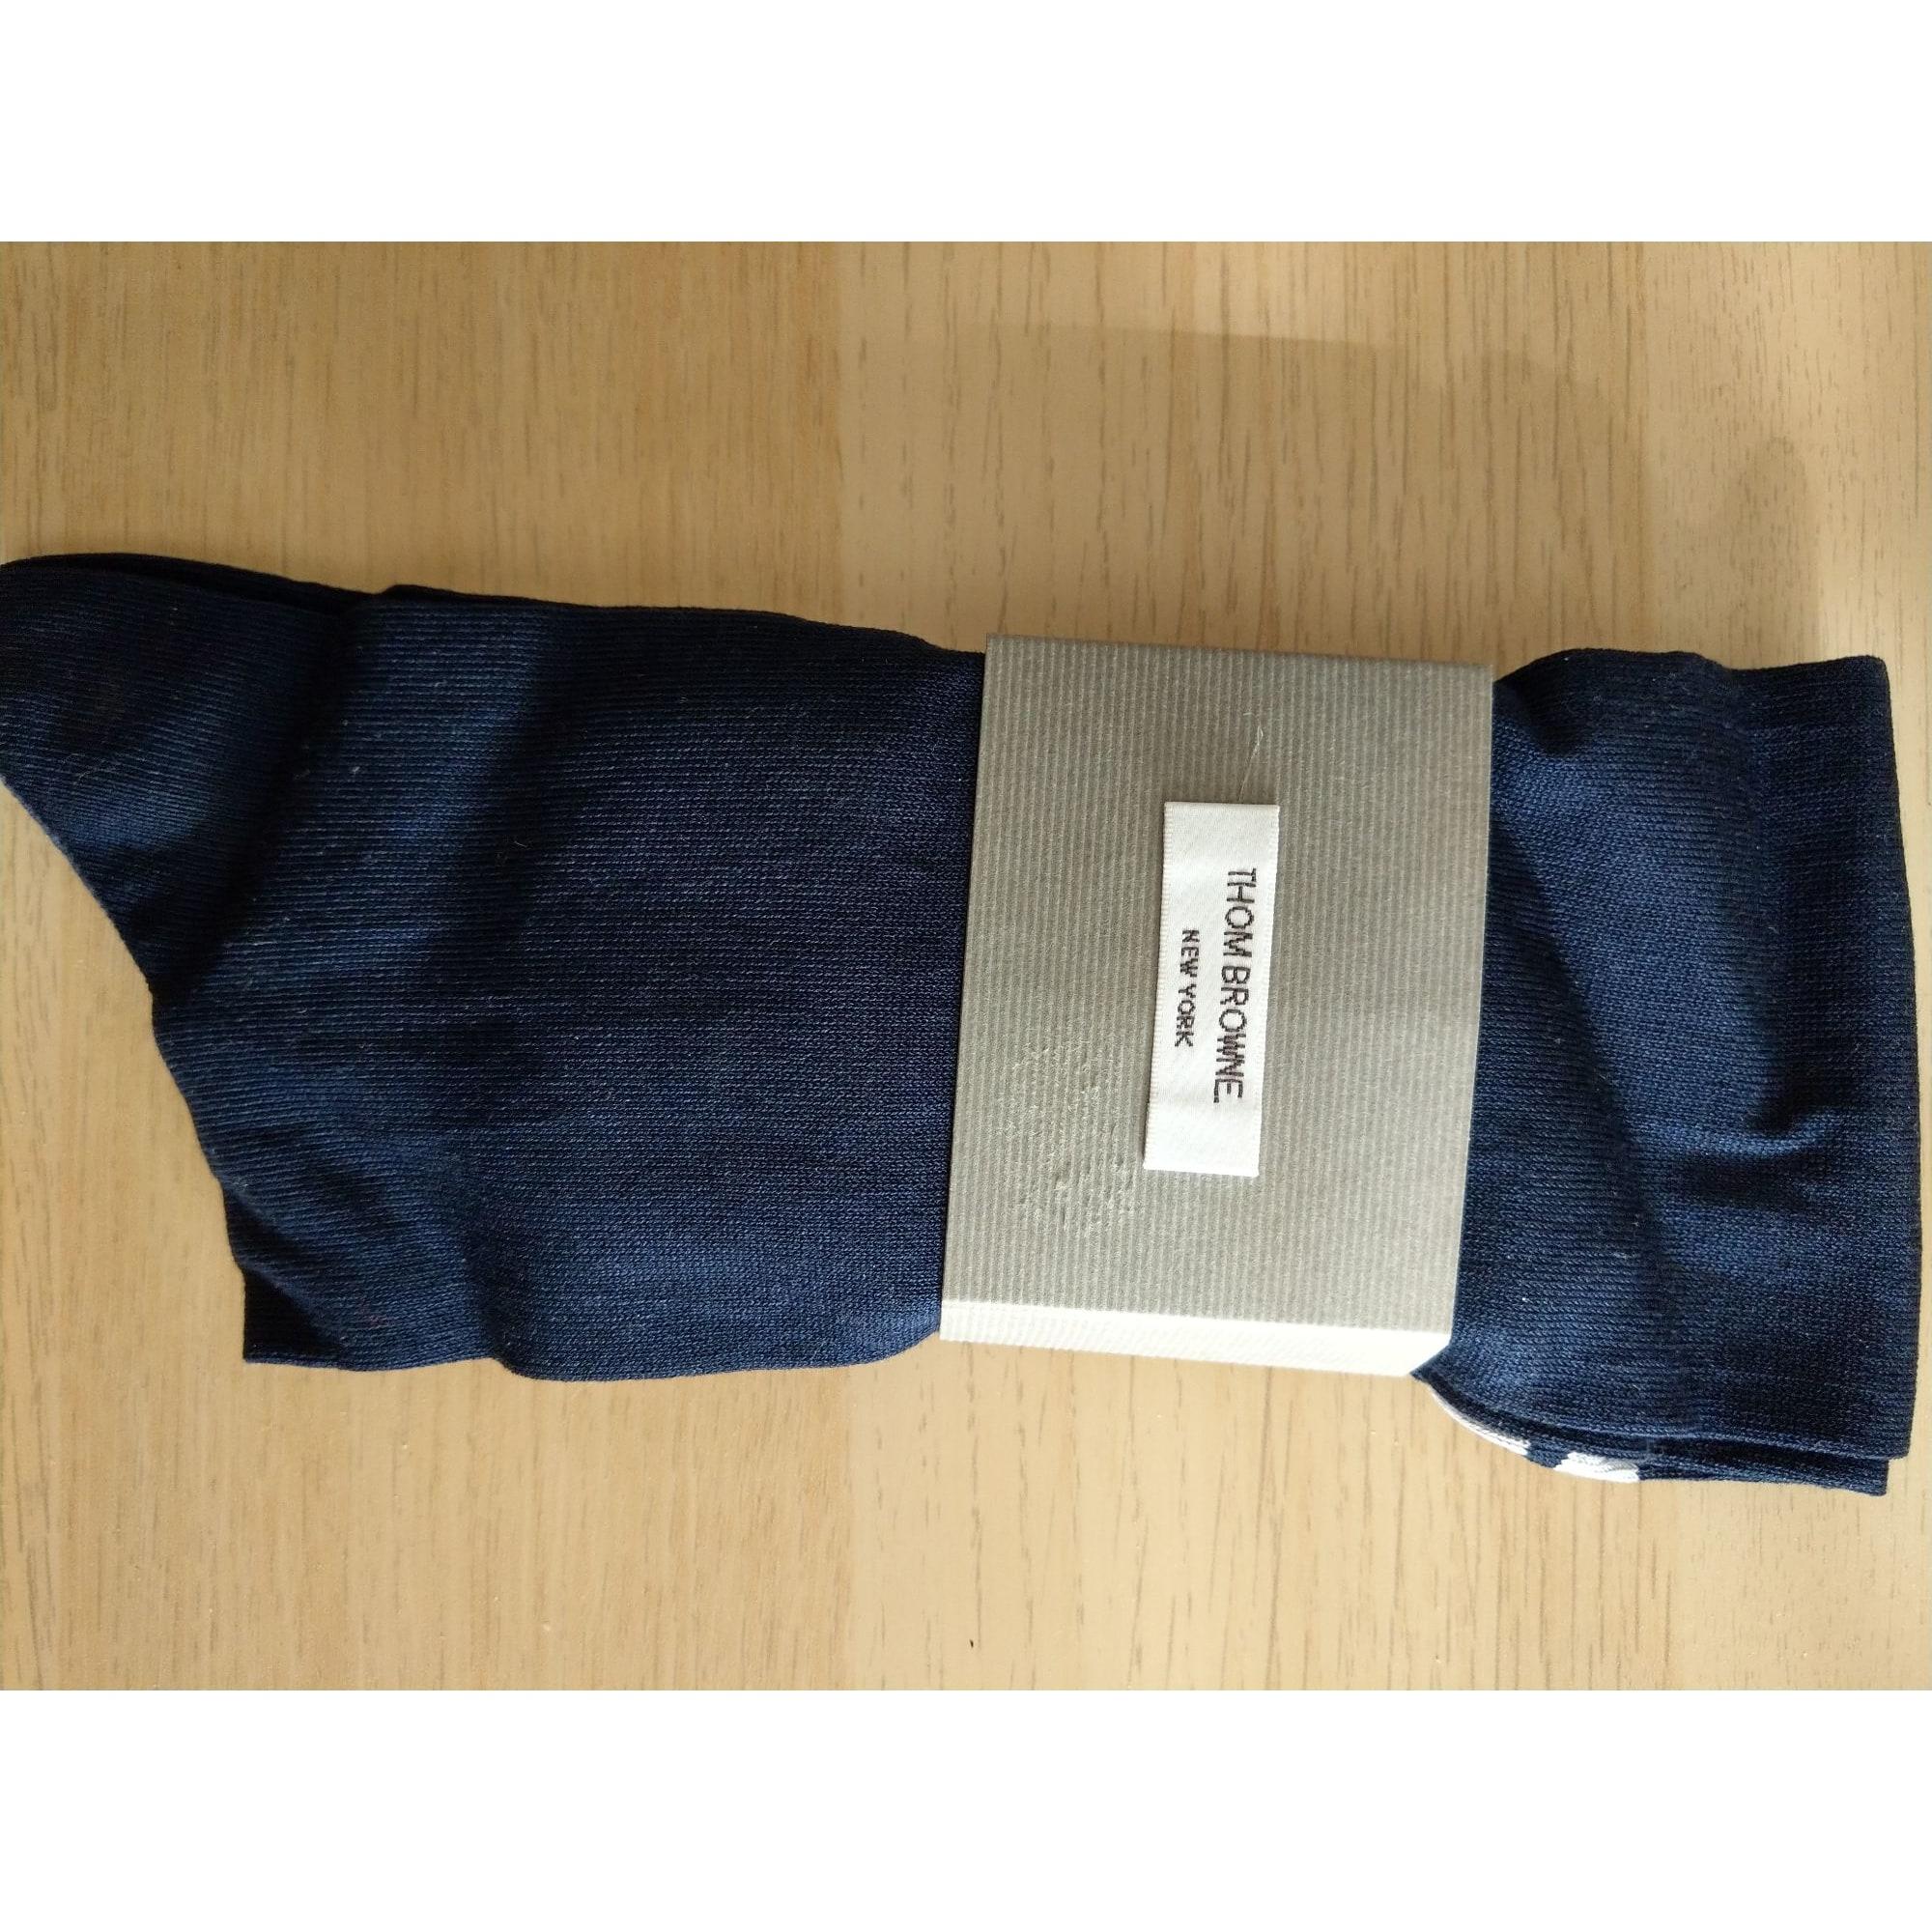 Chaussettes mi-cuisse THOM BROWNE Bleu, bleu marine, bleu turquoise